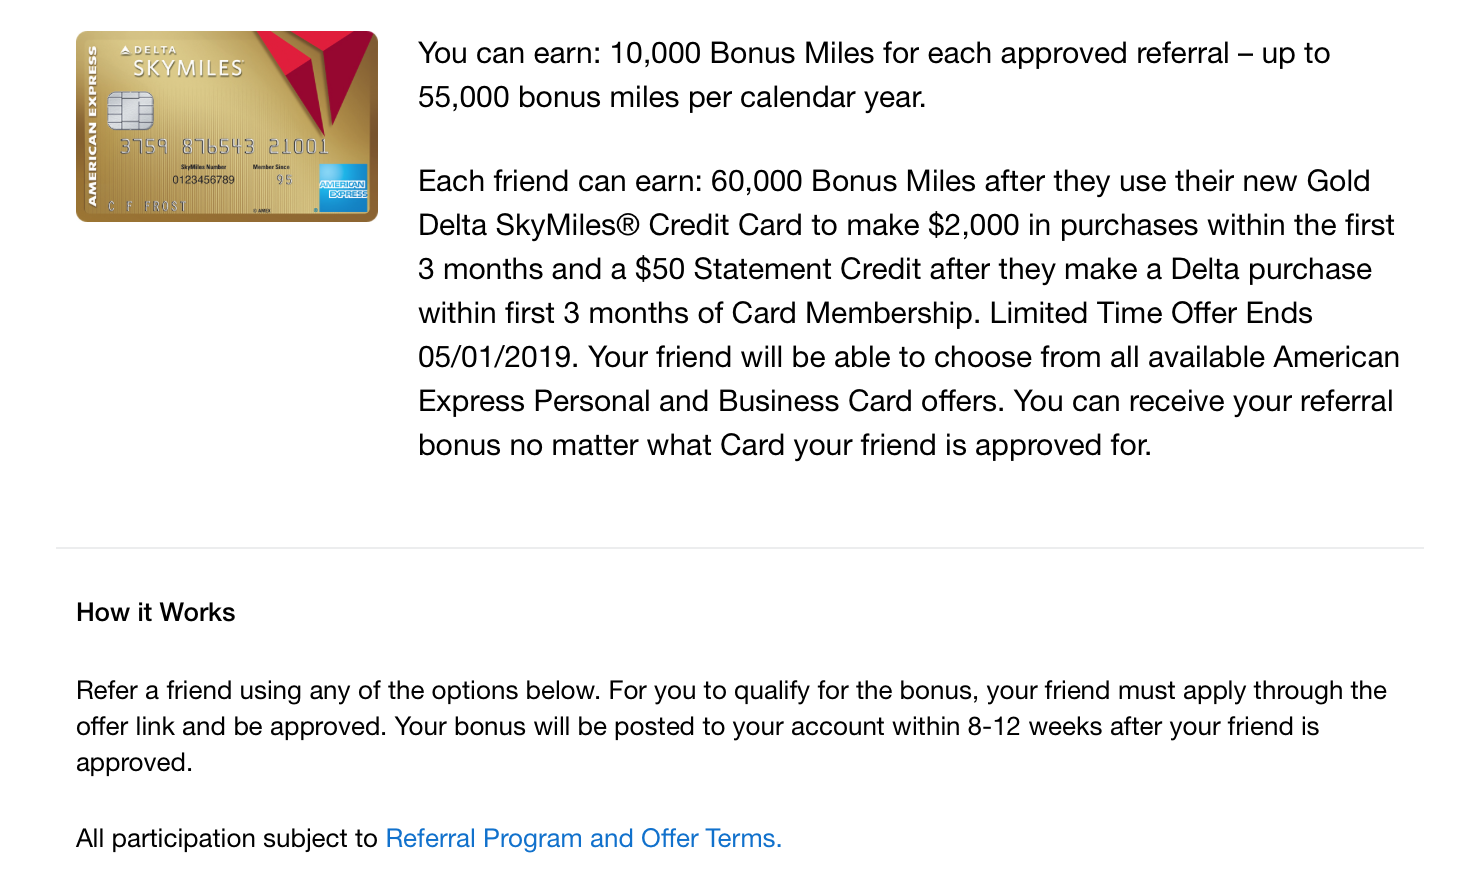 Delta skymiles referral bonus miles skymiles.png